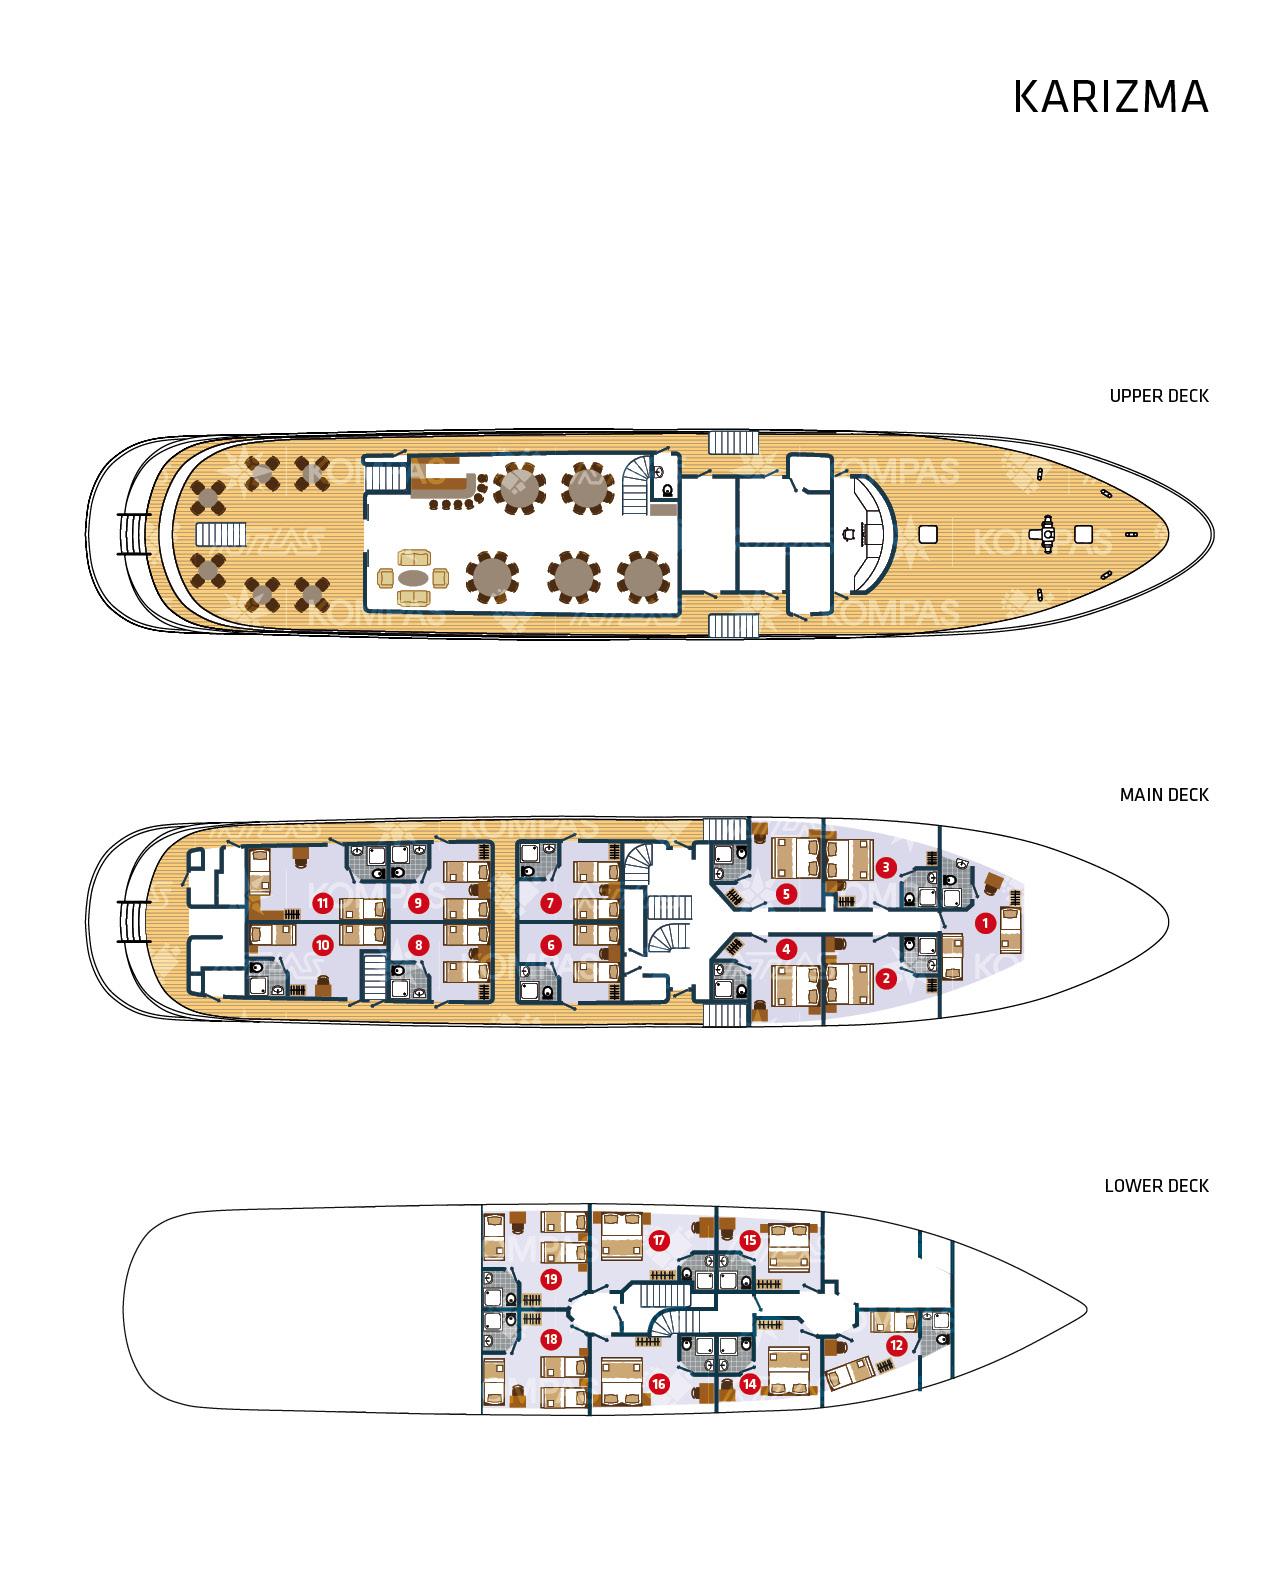 MS Karizma Deck Plan